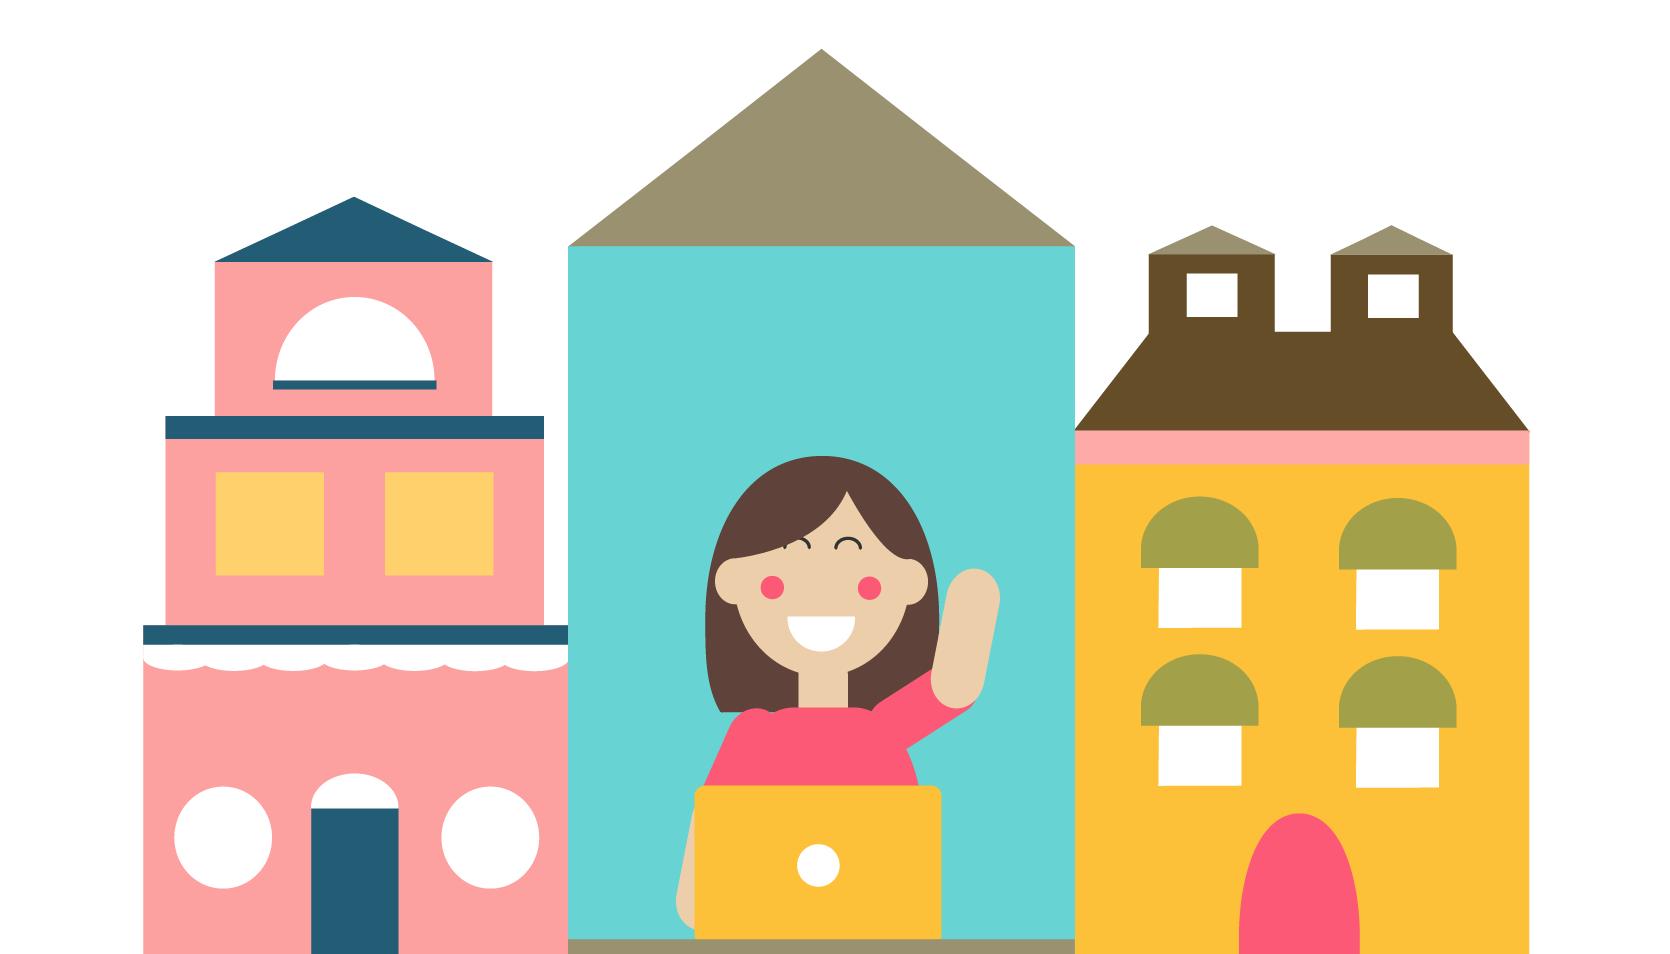 Illustration of Tuts Town designer waving goodbye from her desk